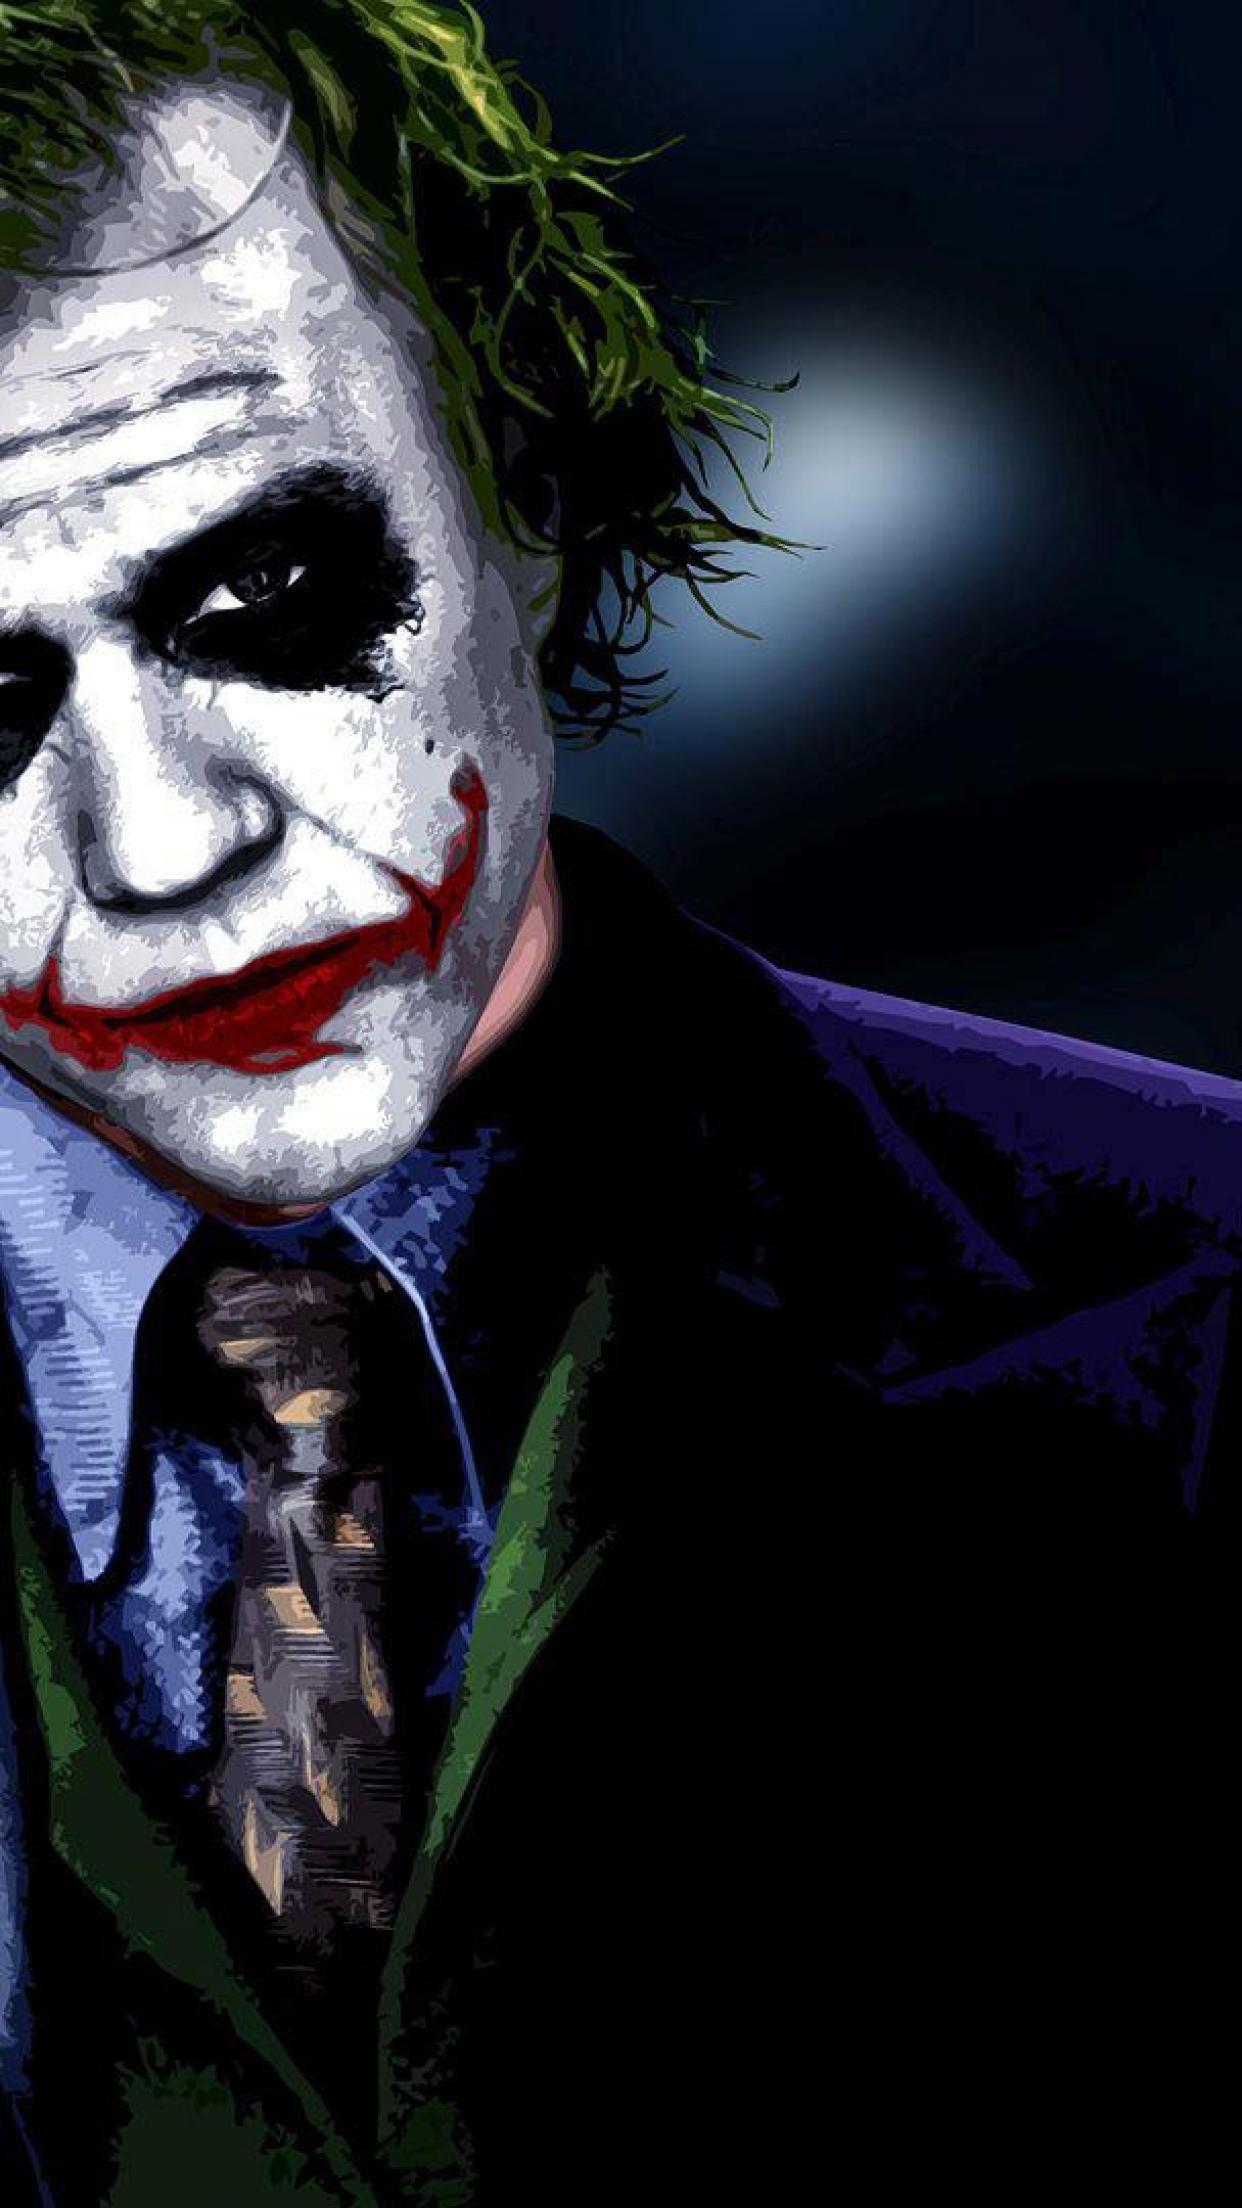 Joker iphone 6 wallpaper 79 images for Desktop joker